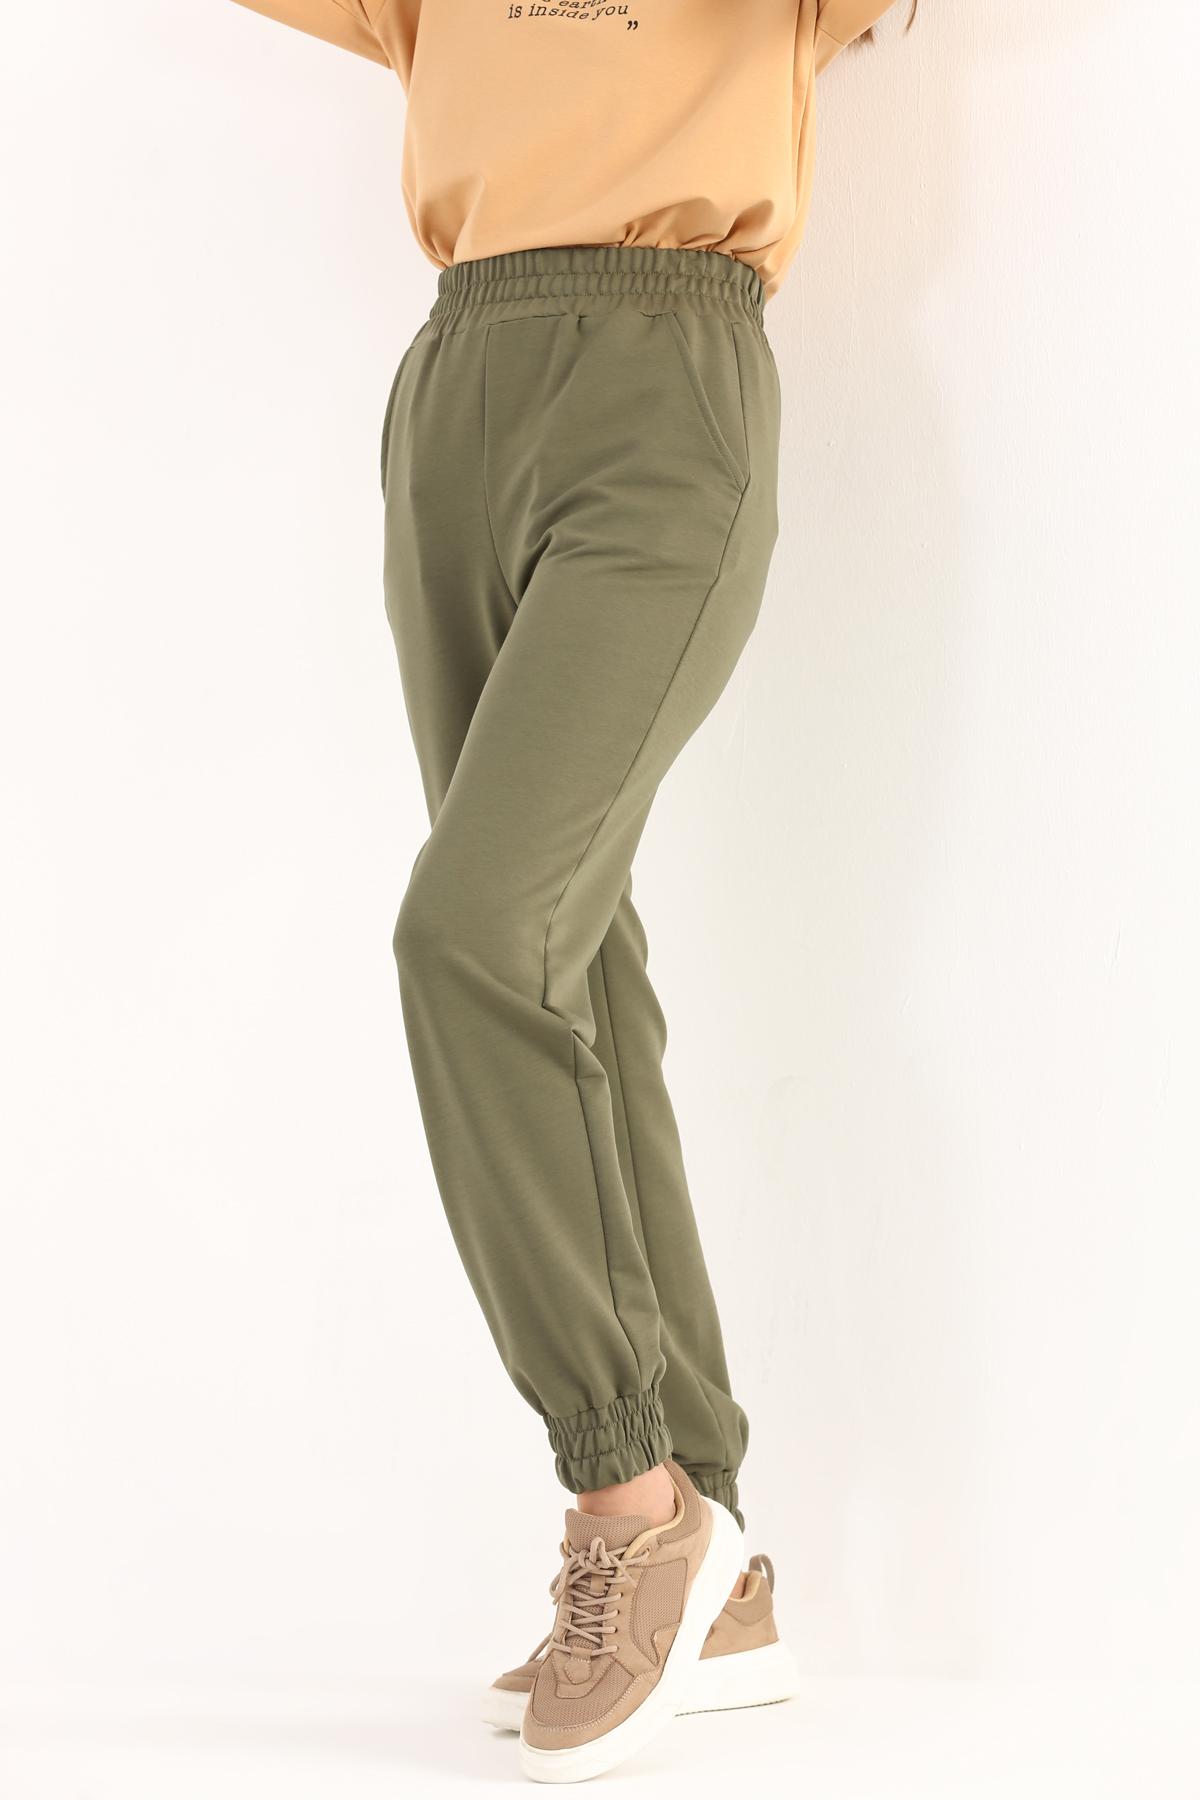 Elastic Waist Cargo Pants With Pockets